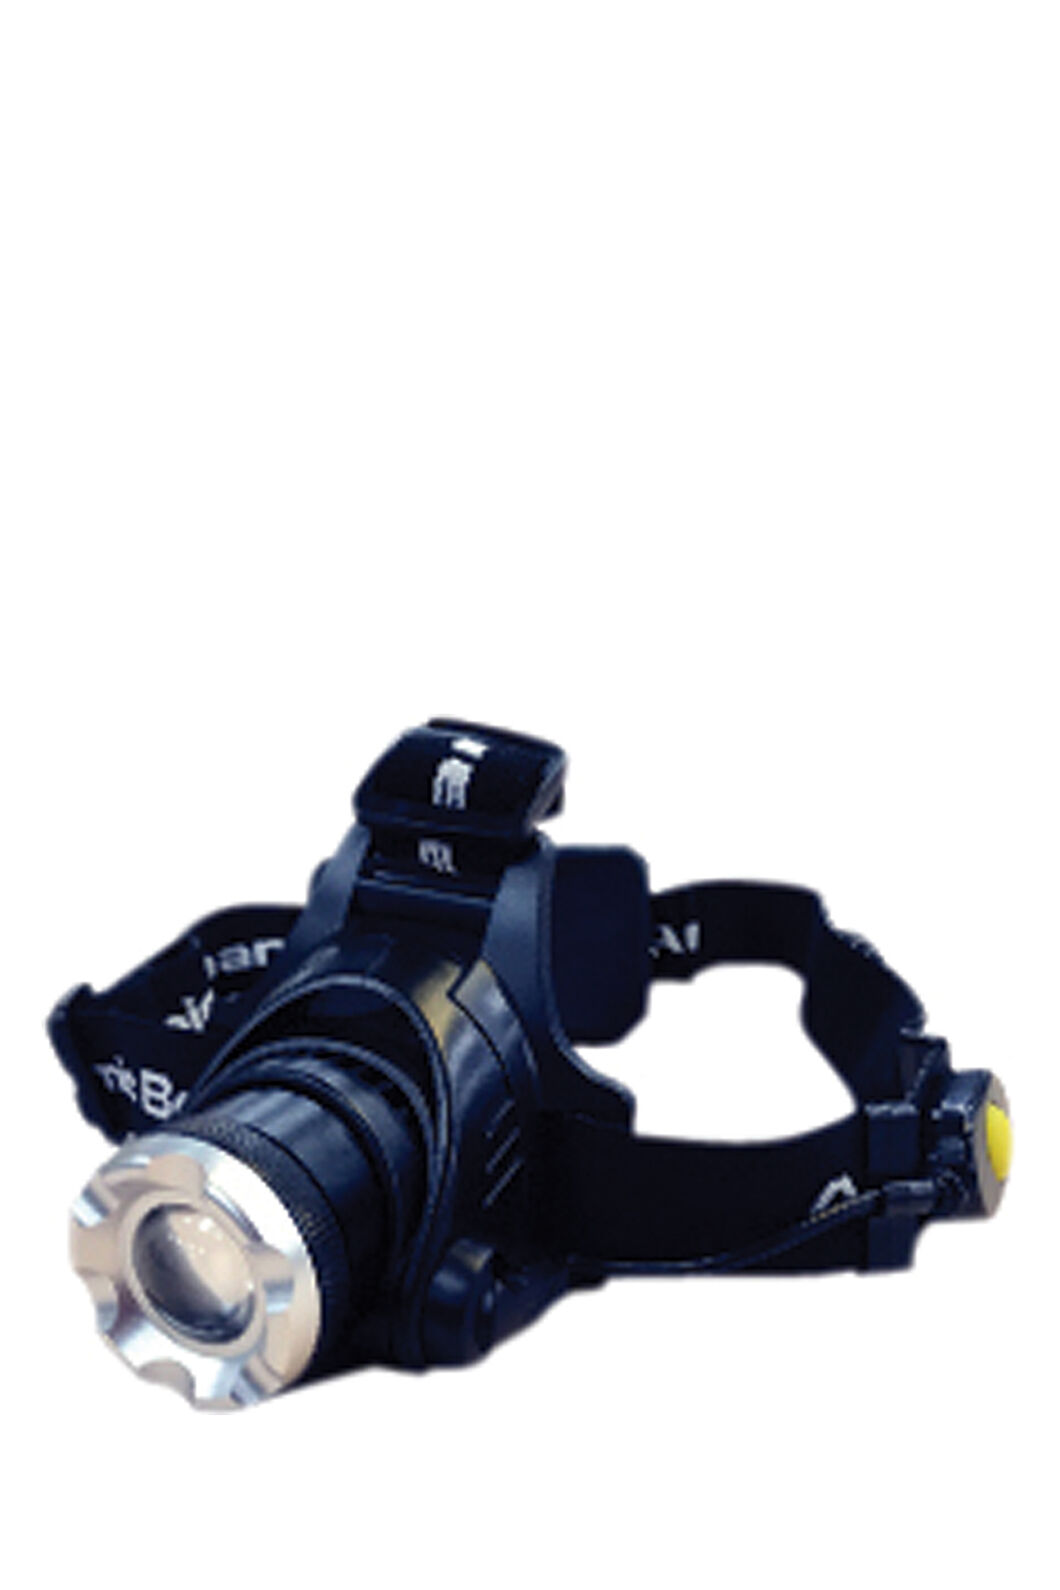 Atomic Beam Headlamp, None, hi-res